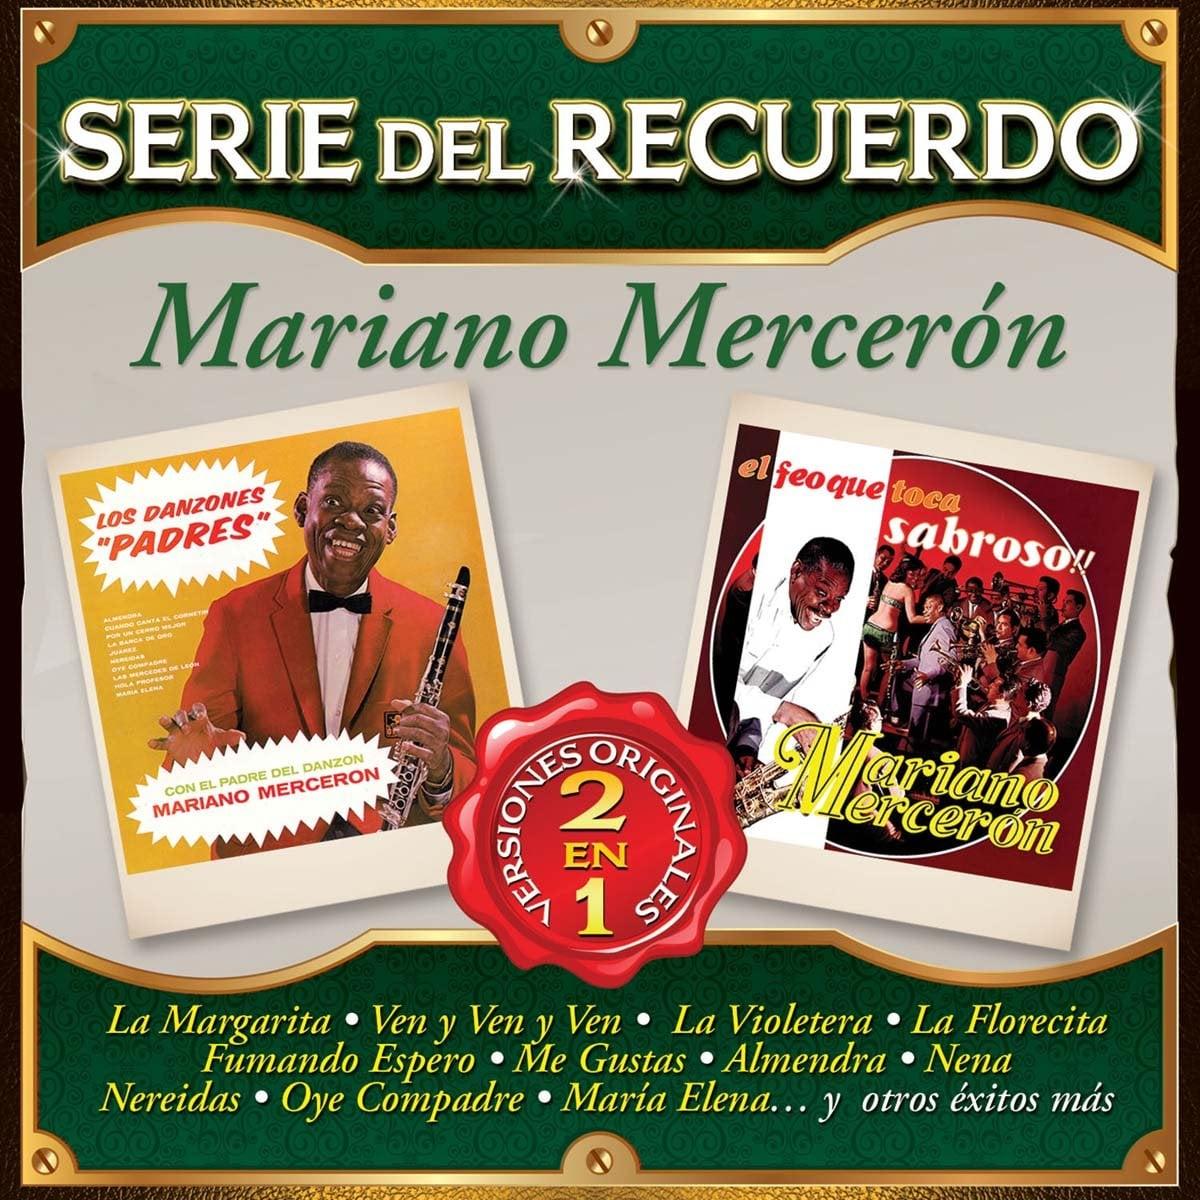 Cd Mariano Merceronpablo Beltran Ruiz Serie Del Recuerdo 2 en 1